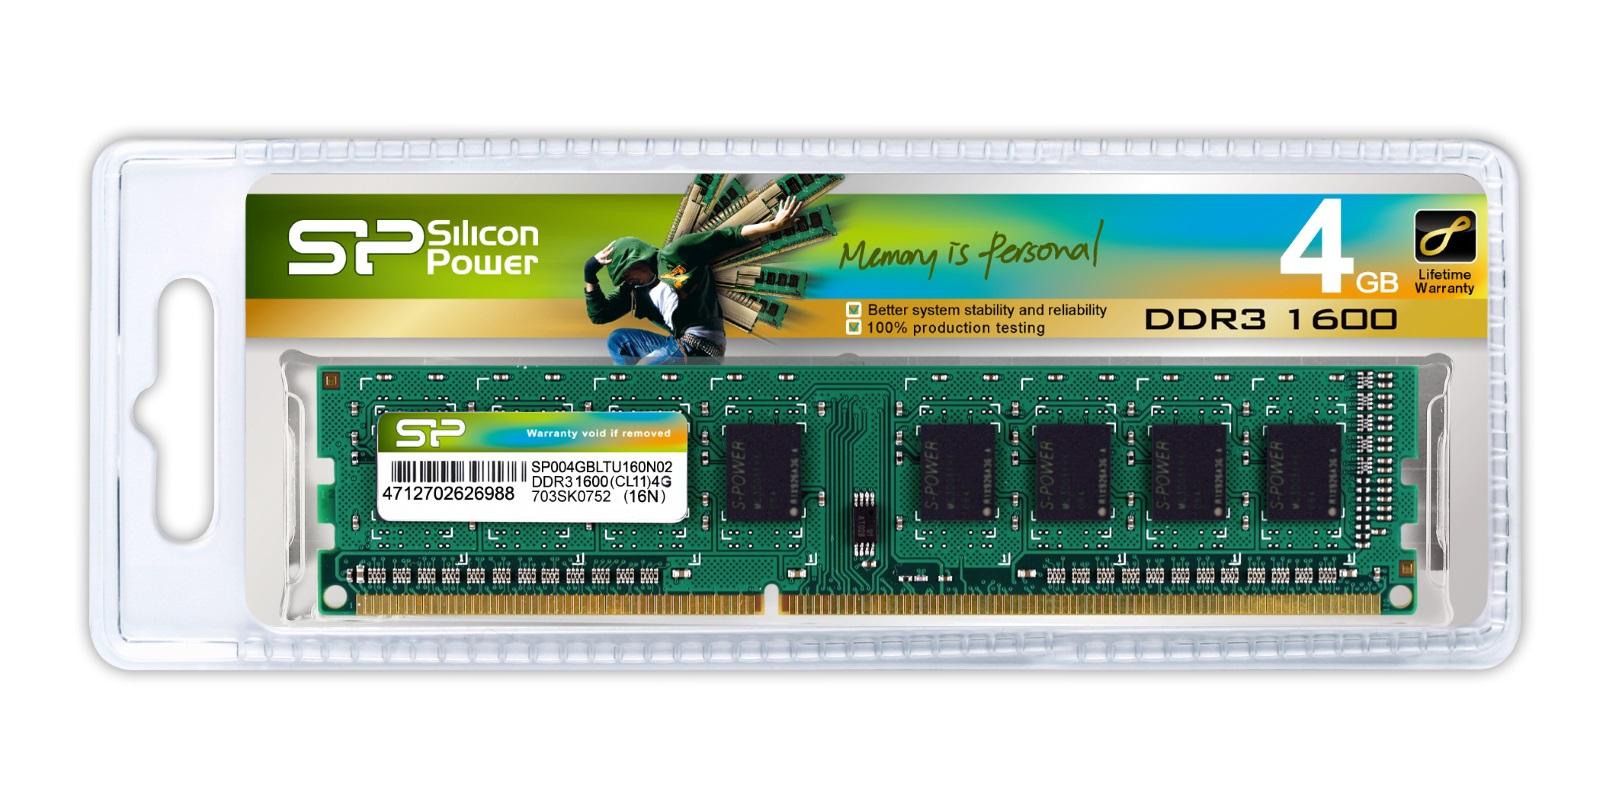 4gb Silicon Power Ddr3 1600mhz Pc3 12800 Desktop Memory Module Cl11 Ram Pc Smart 2gb 240 Pins